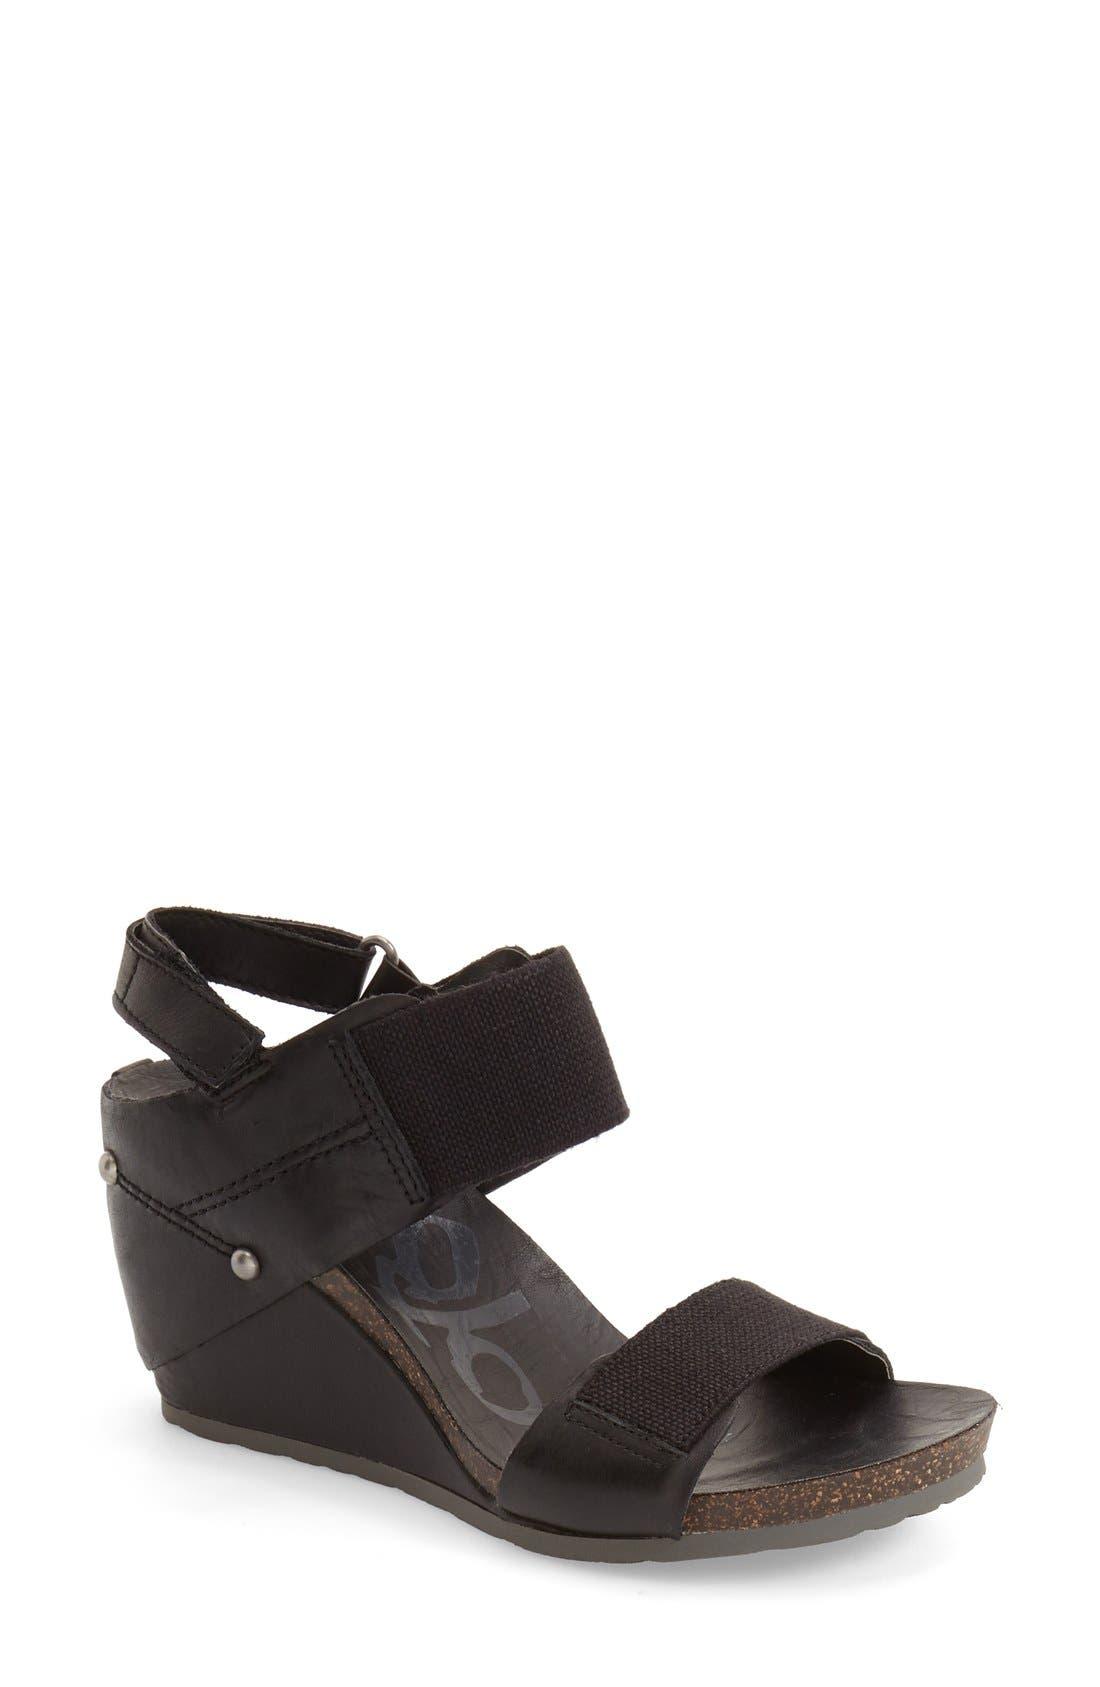 'Trailblazer' Wedge Sandal,                         Main,                         color, Black Leather